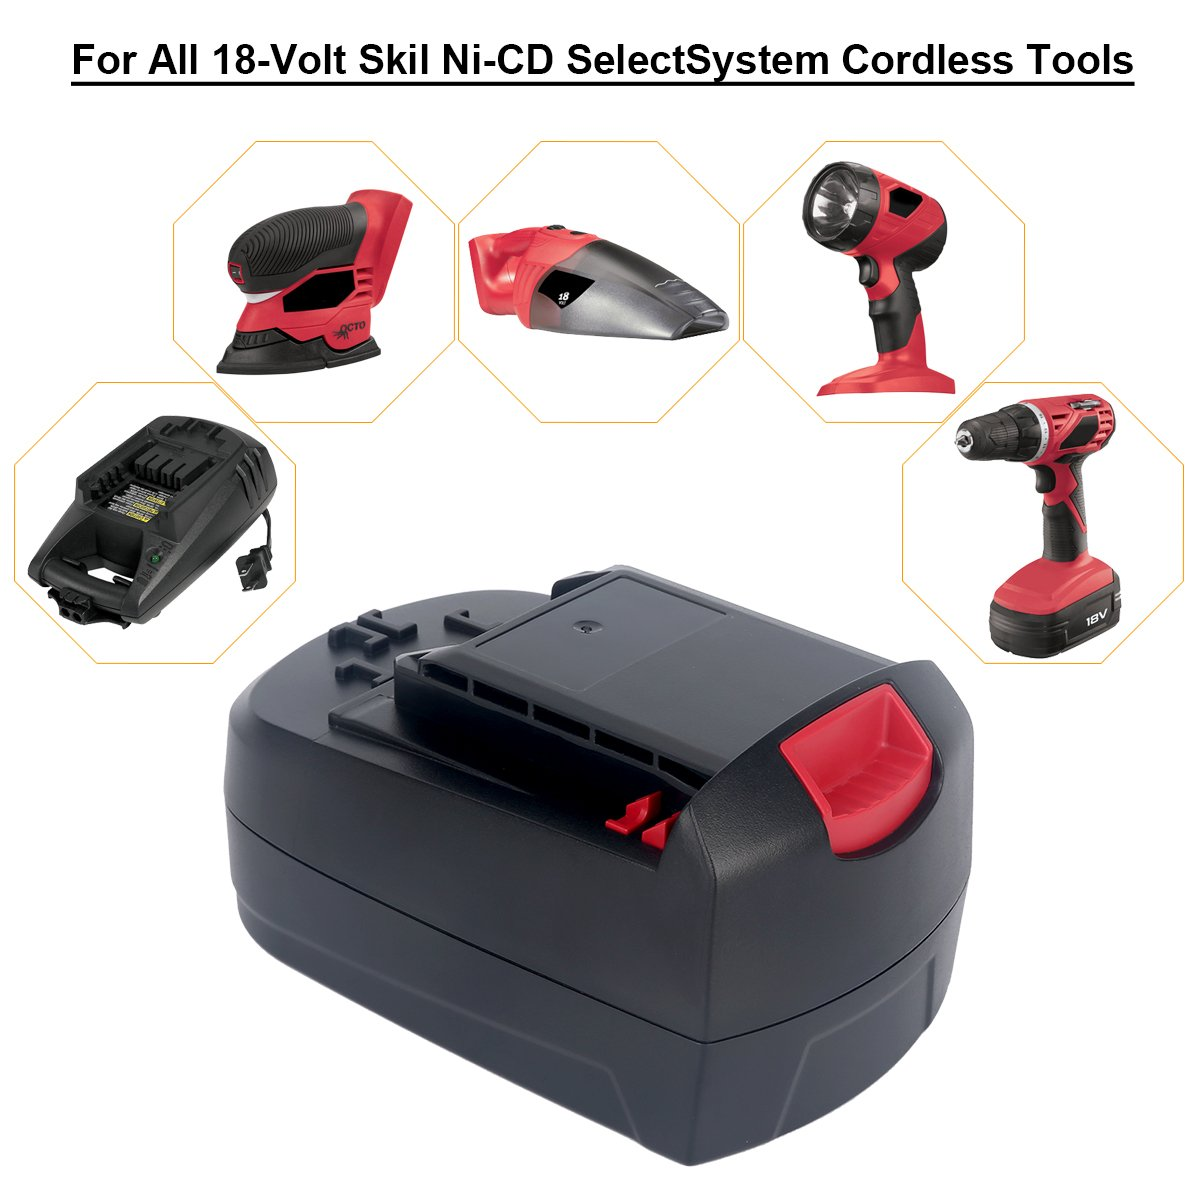 Biswaye 2Pack 18V Battery SB18C SB18A SB18B for Skil 18V Select System Cordless Tools 2810 2888 2895 2897 2898 4570 5850 5995 7305 9350, 3000mAh Ni-Cd by Biswaye (Image #6)